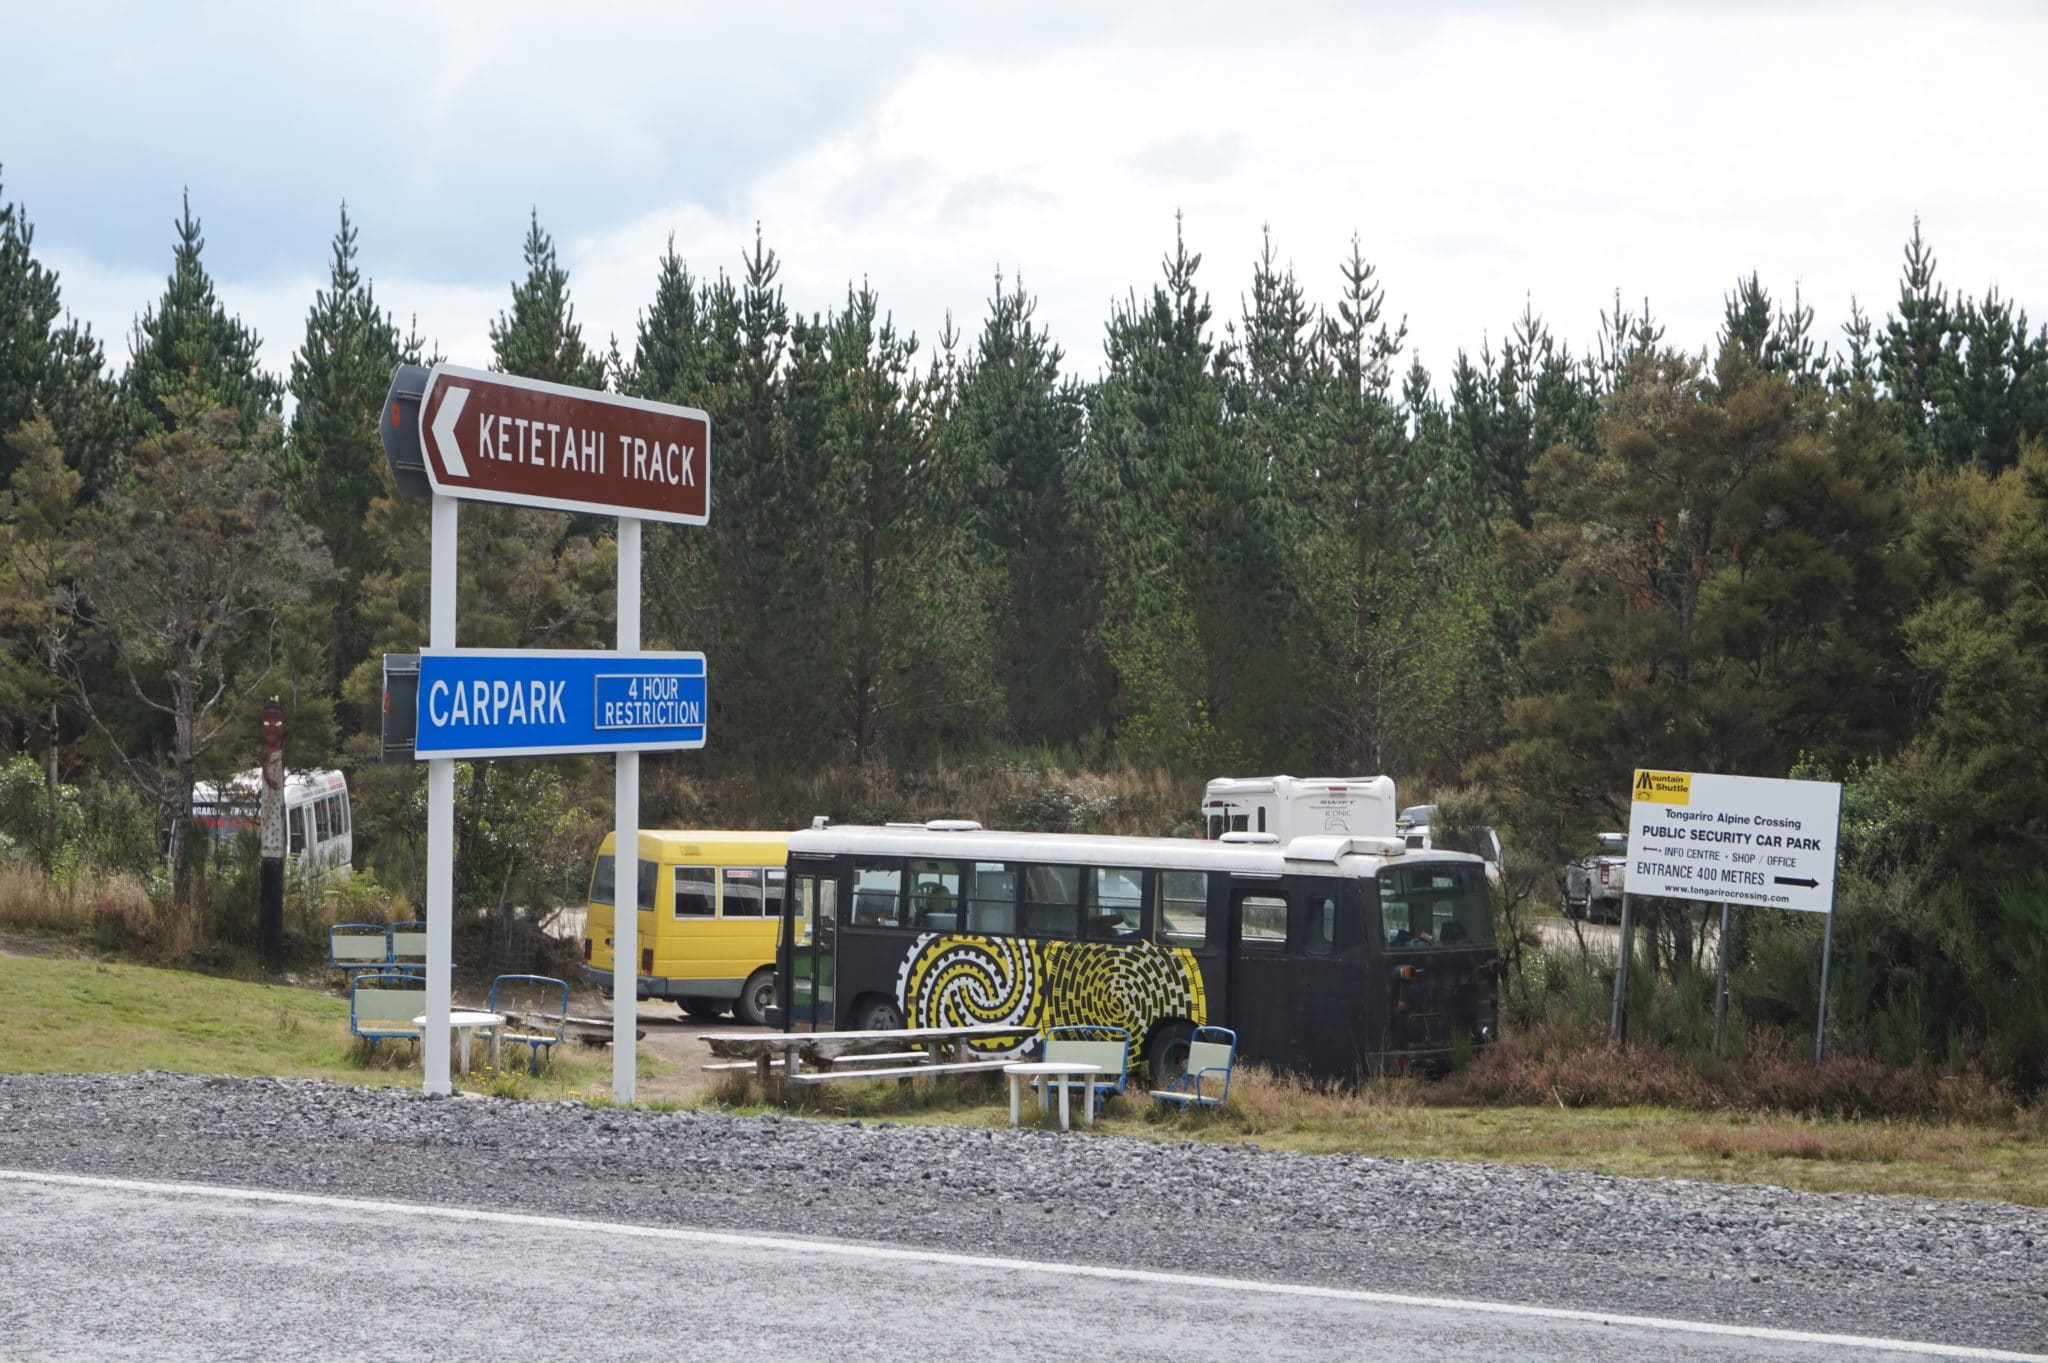 Parkmöglichkeit am Tongariro Alpine Crossing